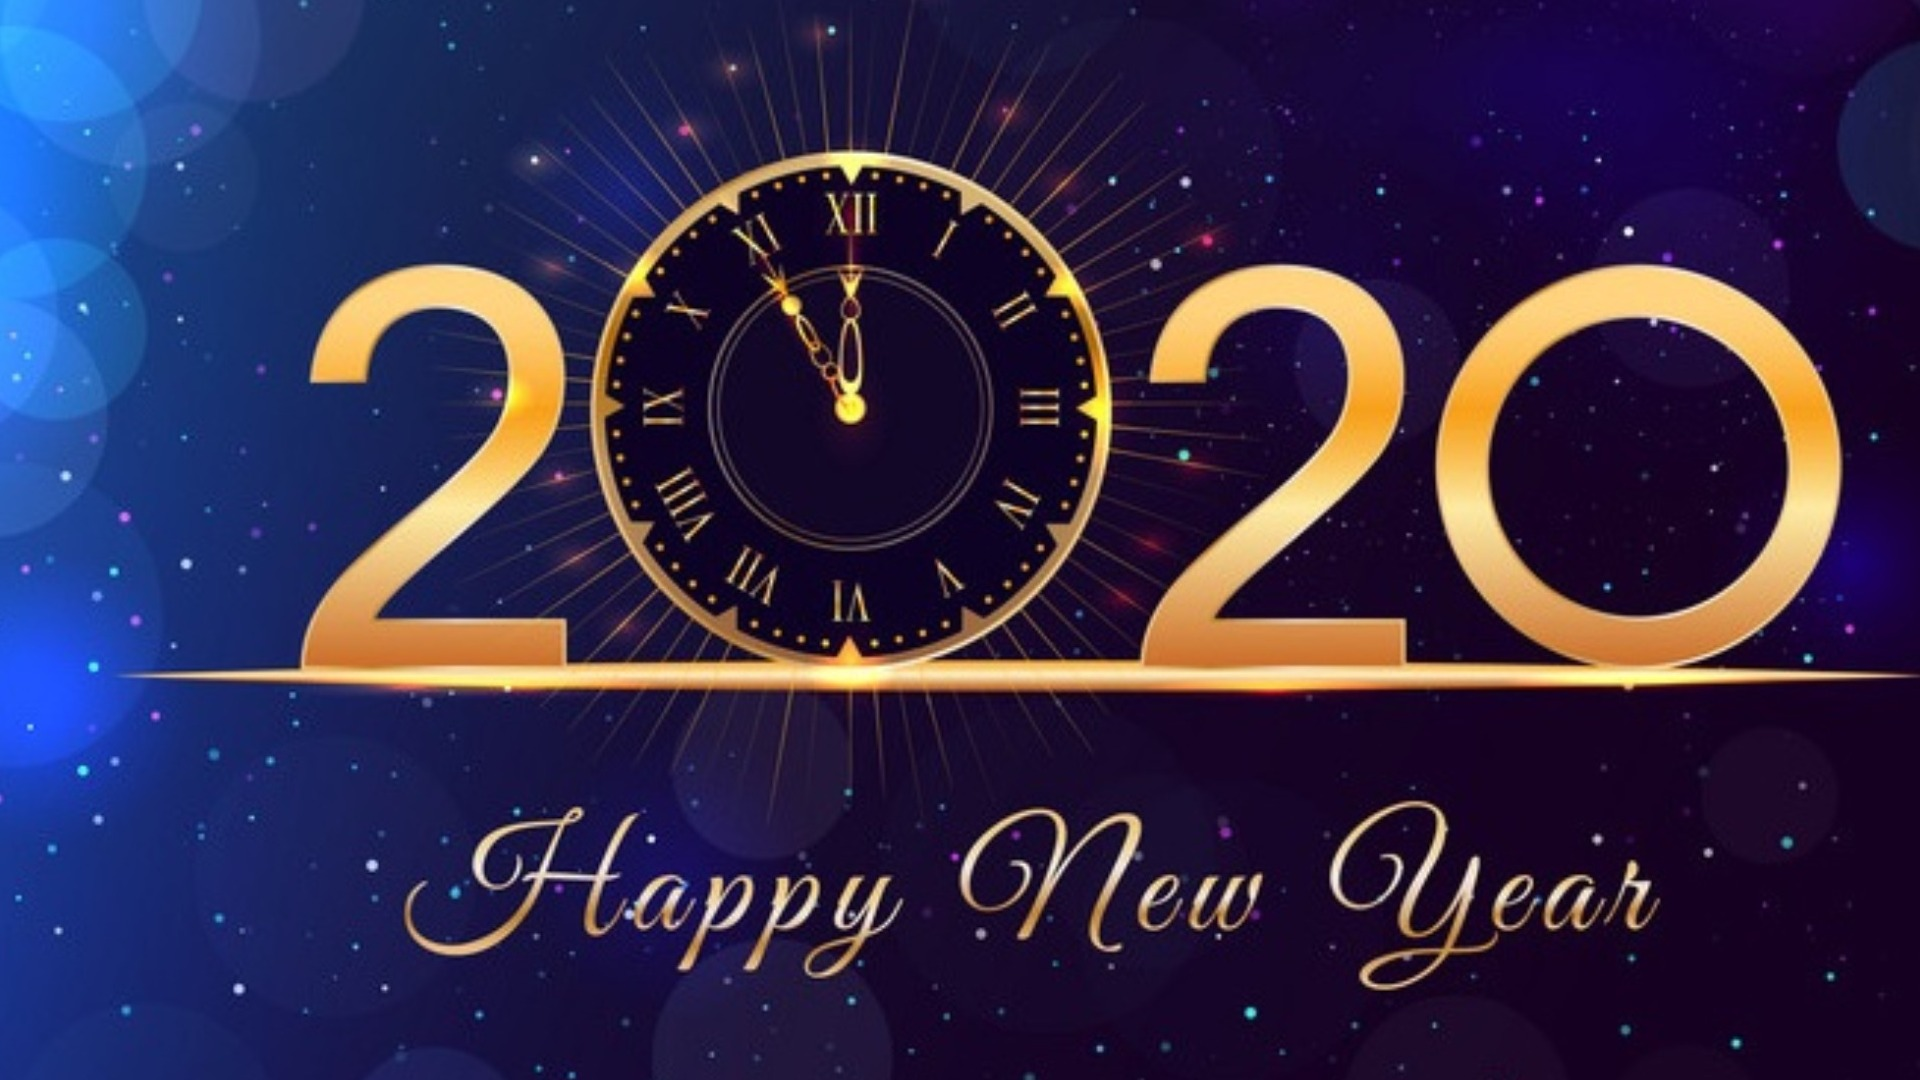 New Year Eve Party 2020 Tickets by Gazebo Inn Resort Udaipur, 31 Dec, 2019,  Udaipur Event